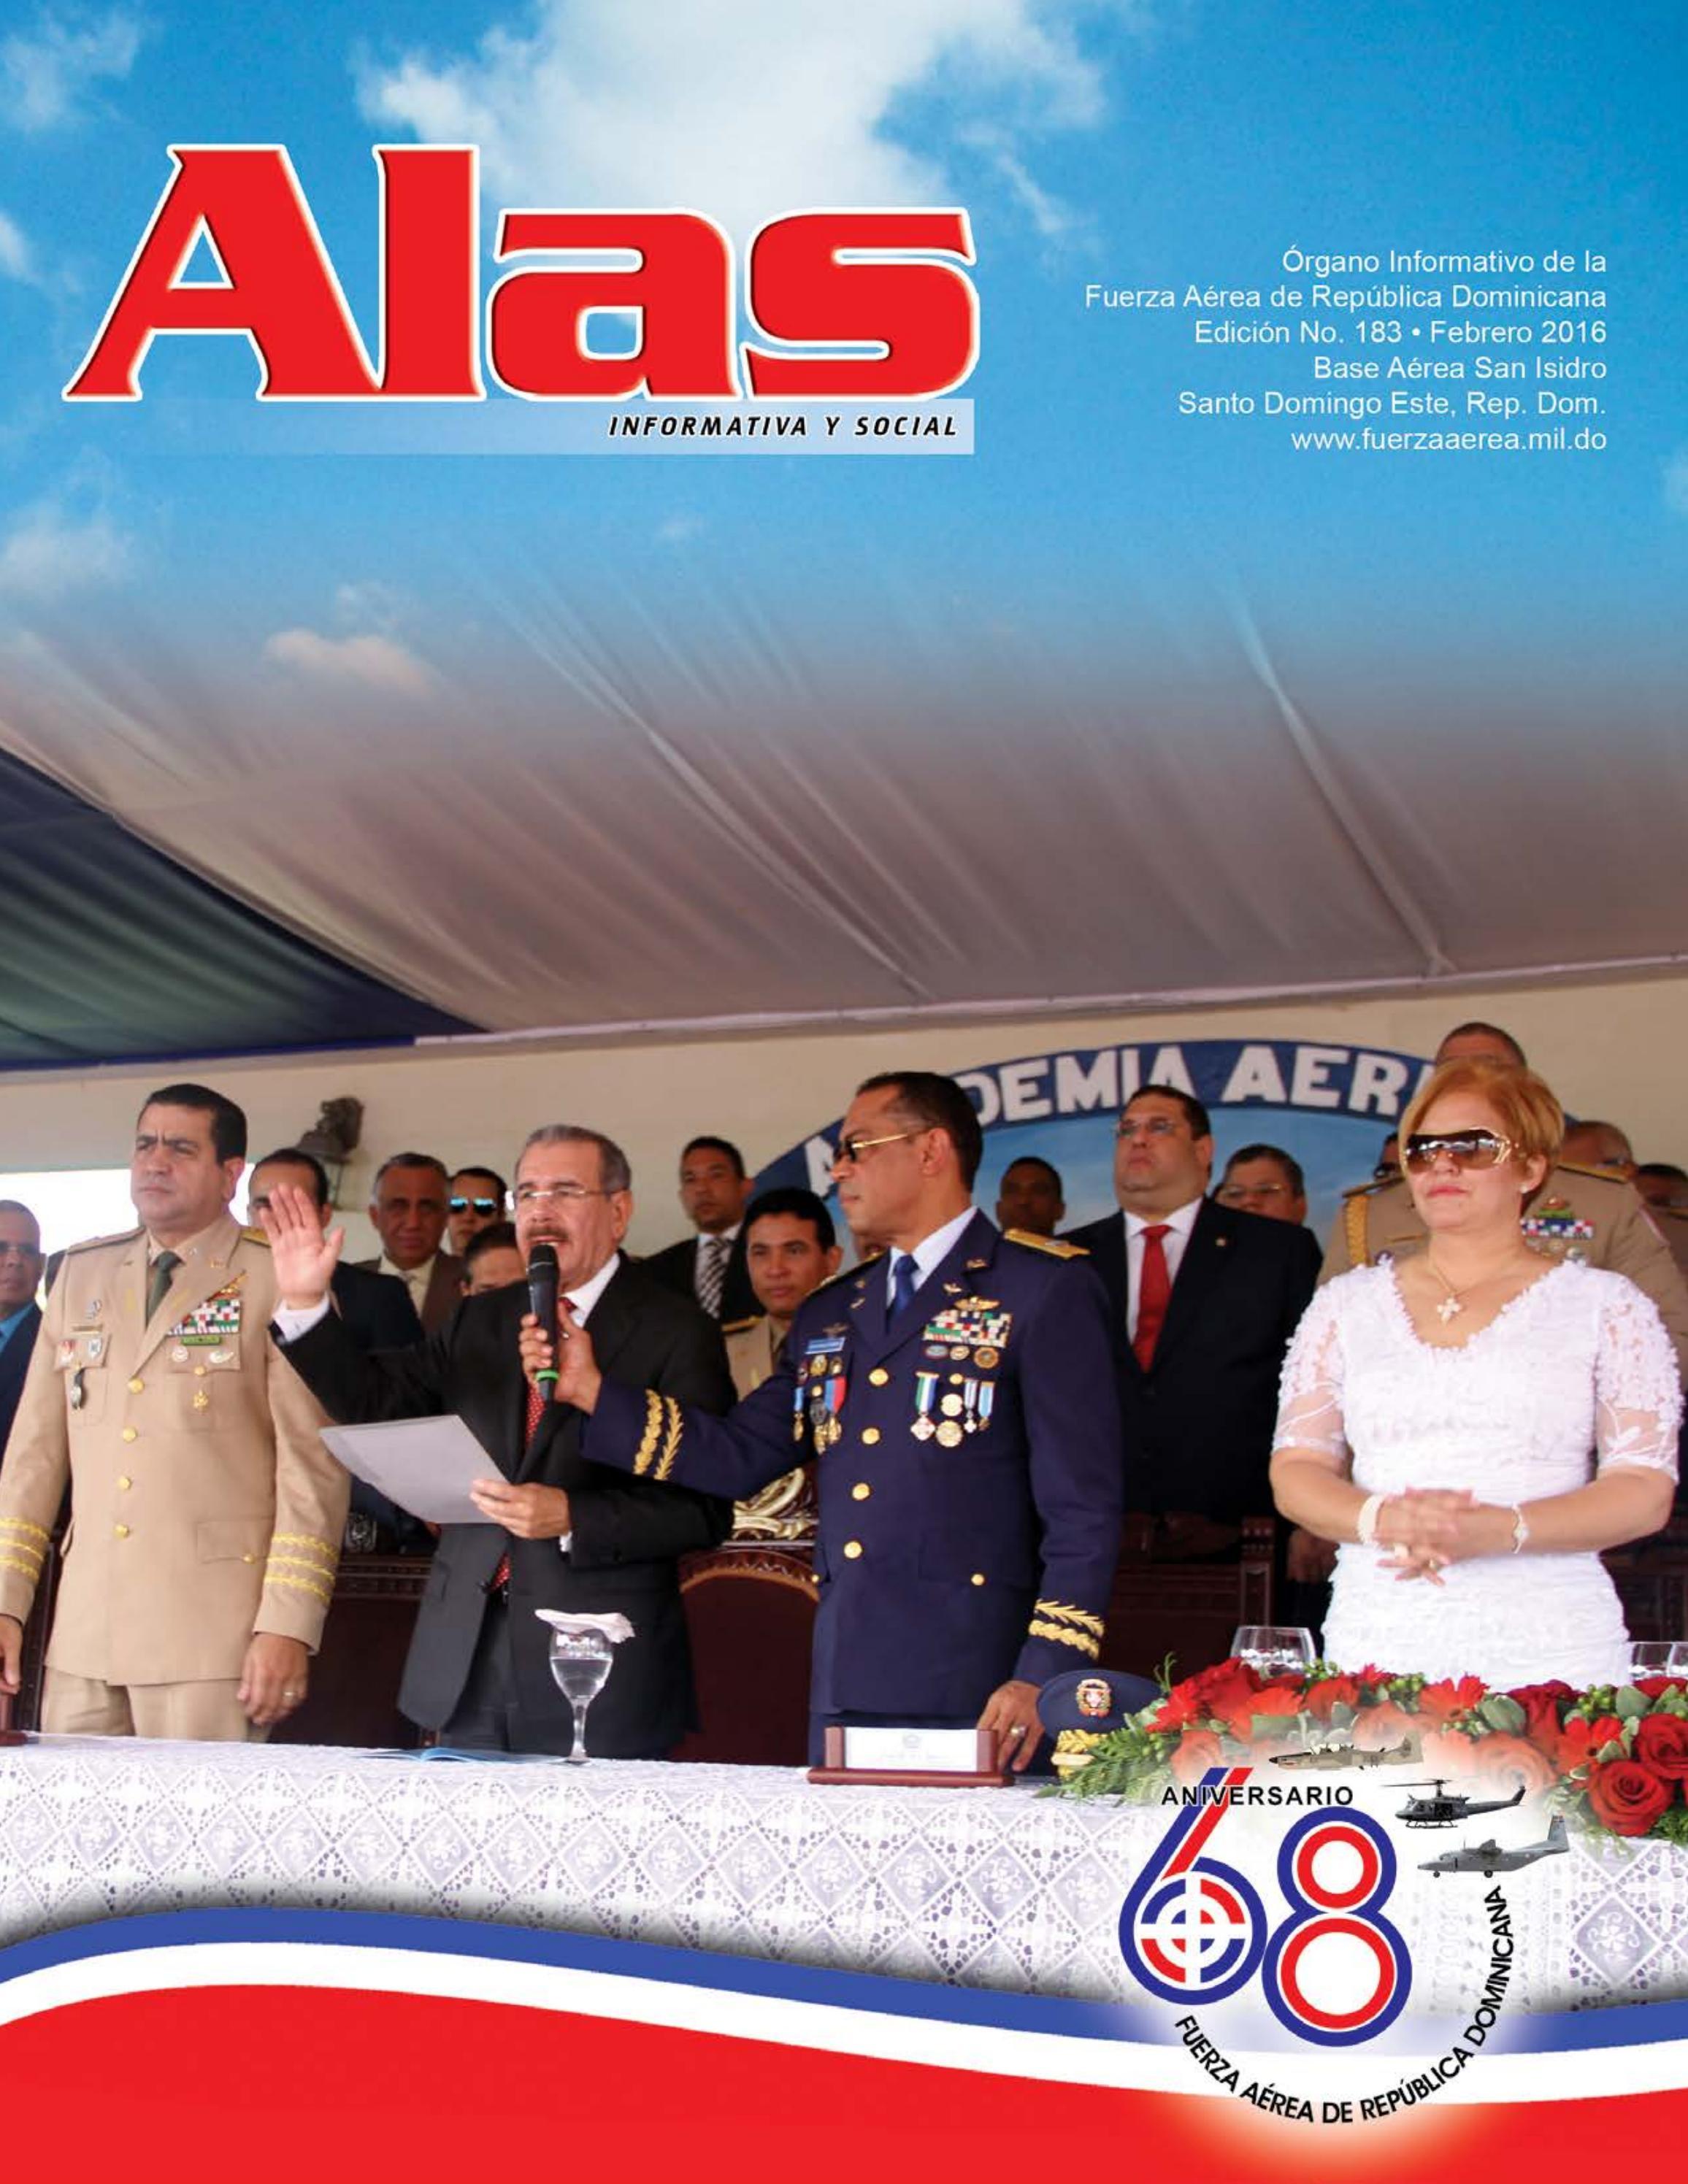 Revista Alas FARD - Edición 183 - Febrero 2016 by Halley González - issuu b2edb7304cc